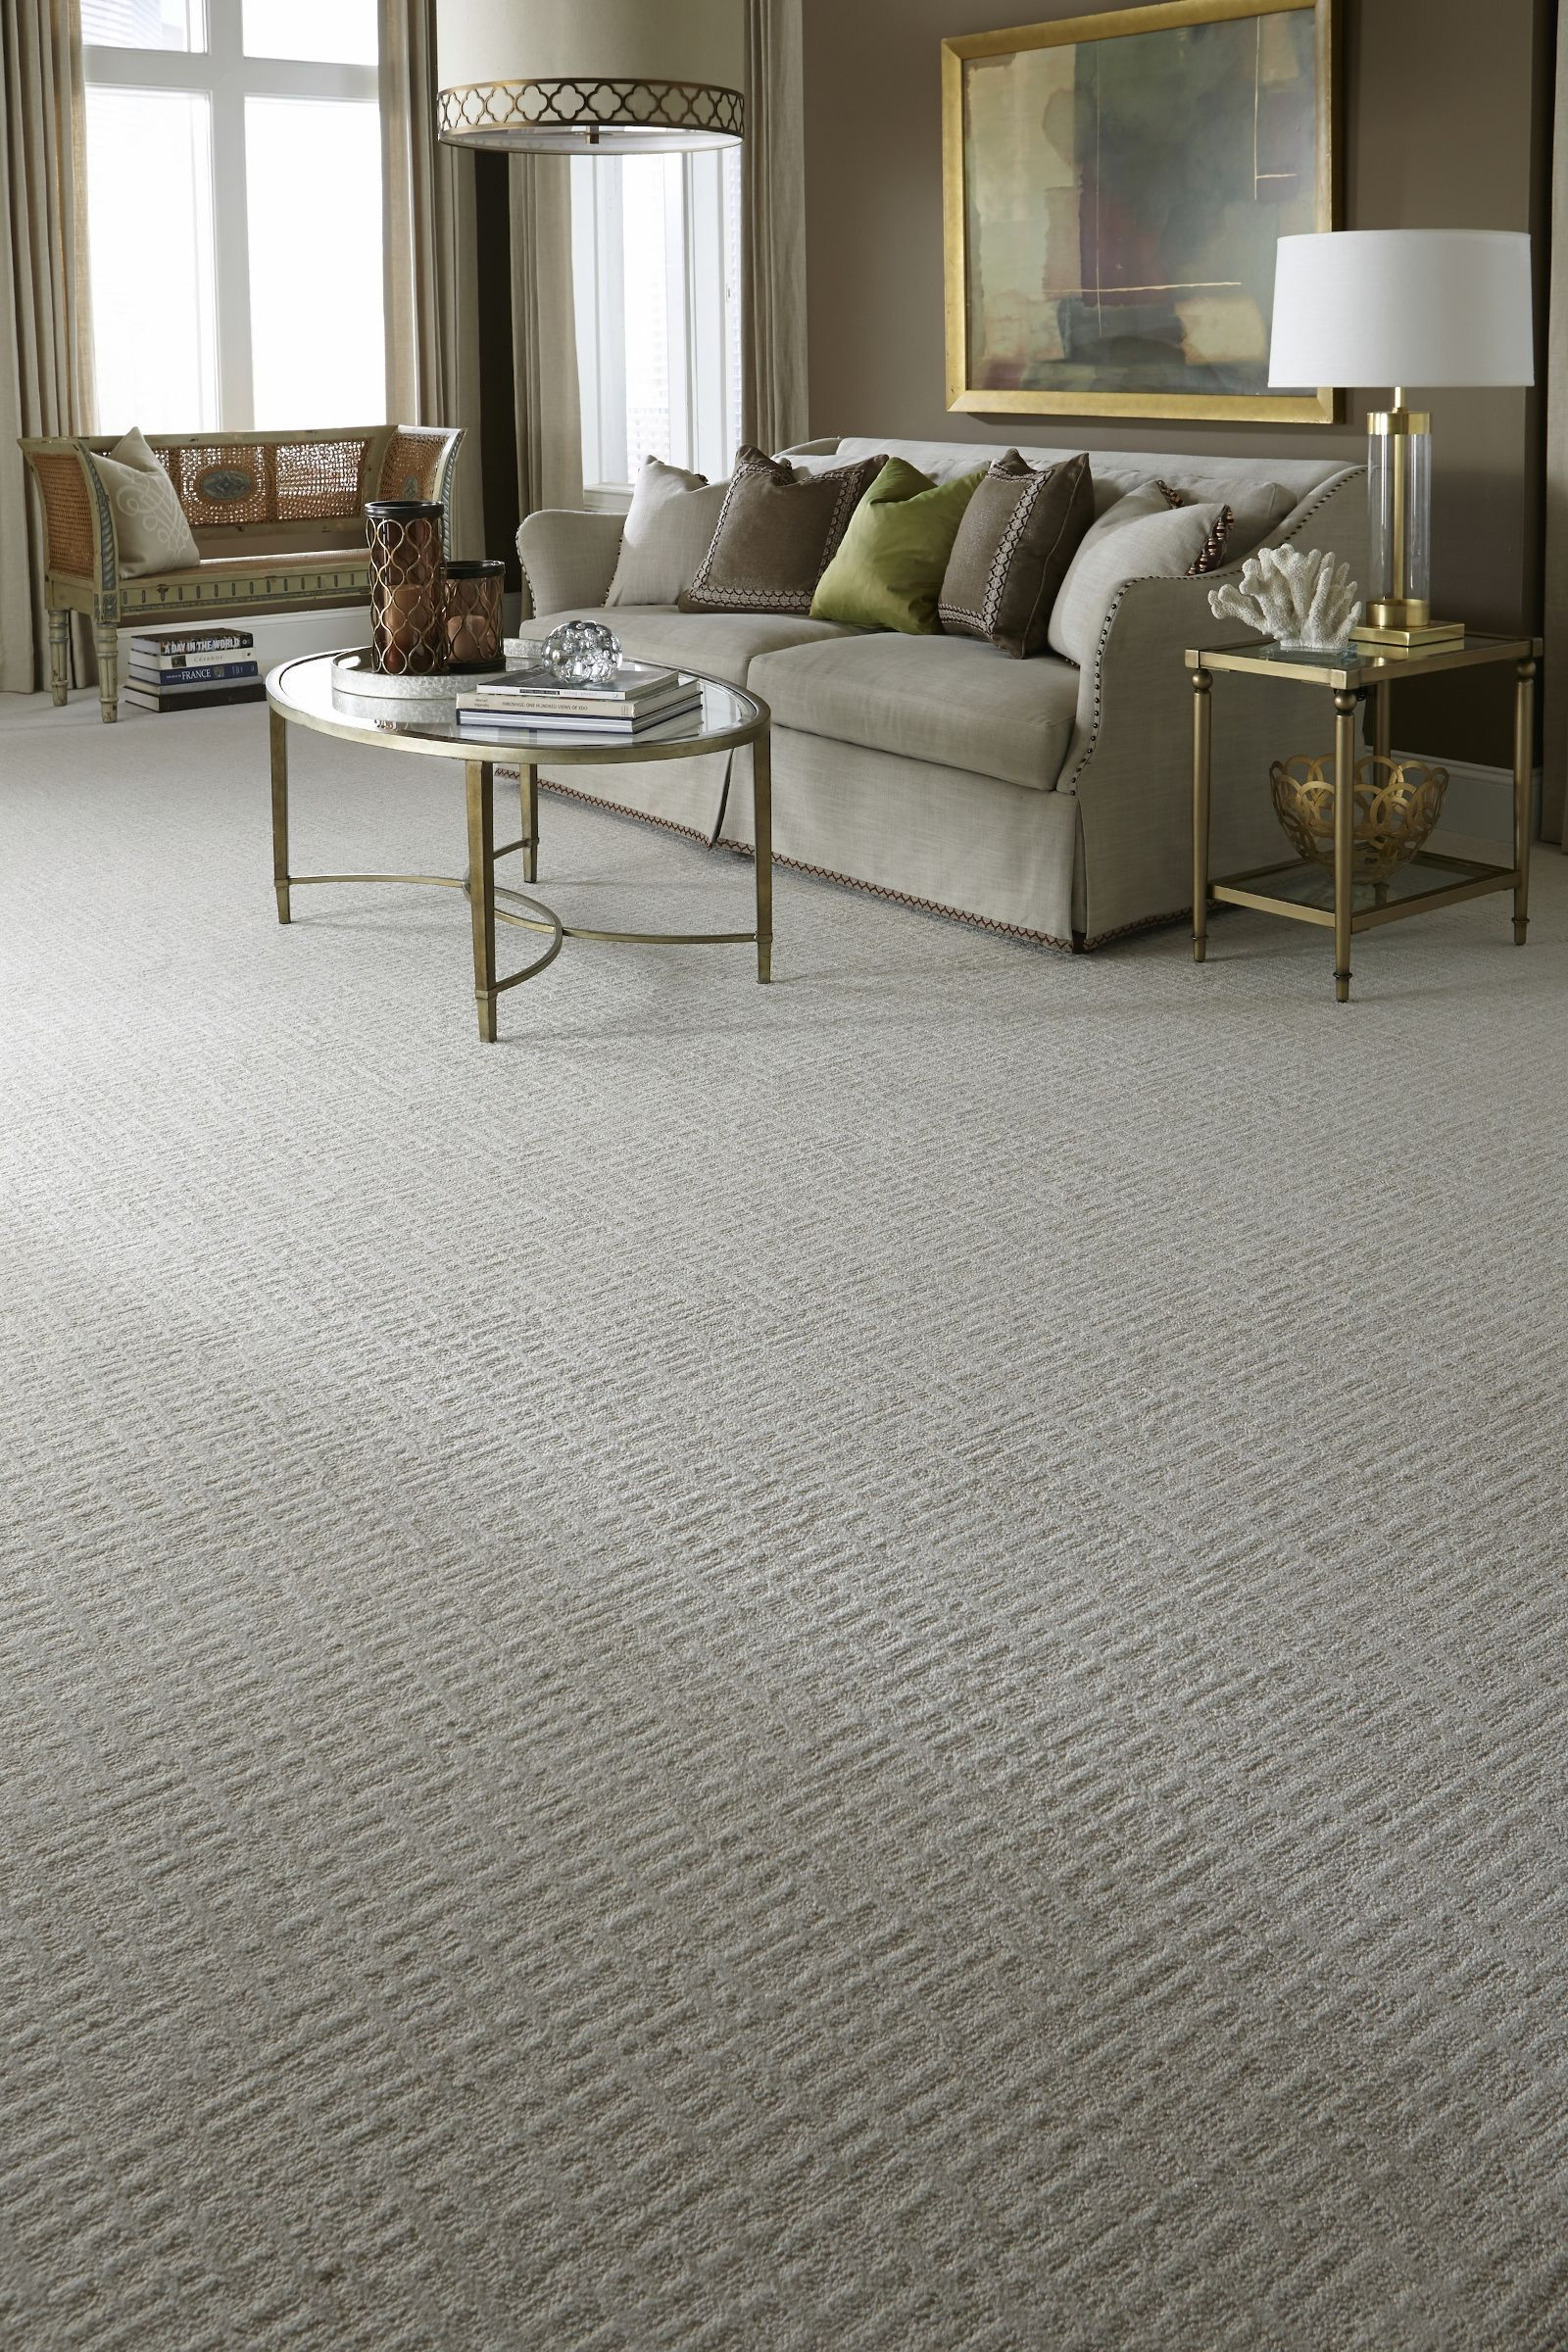 Pin On Basement Carpet